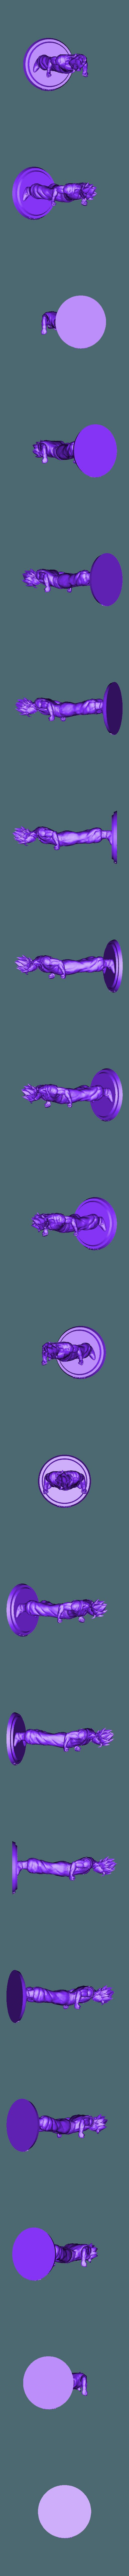 SonGoku_SSJ2 complete (repaired).stl Télécharger fichier STL Son Goku (Super Saiyan 2) • Objet pour imprimante 3D, Andreasfendt